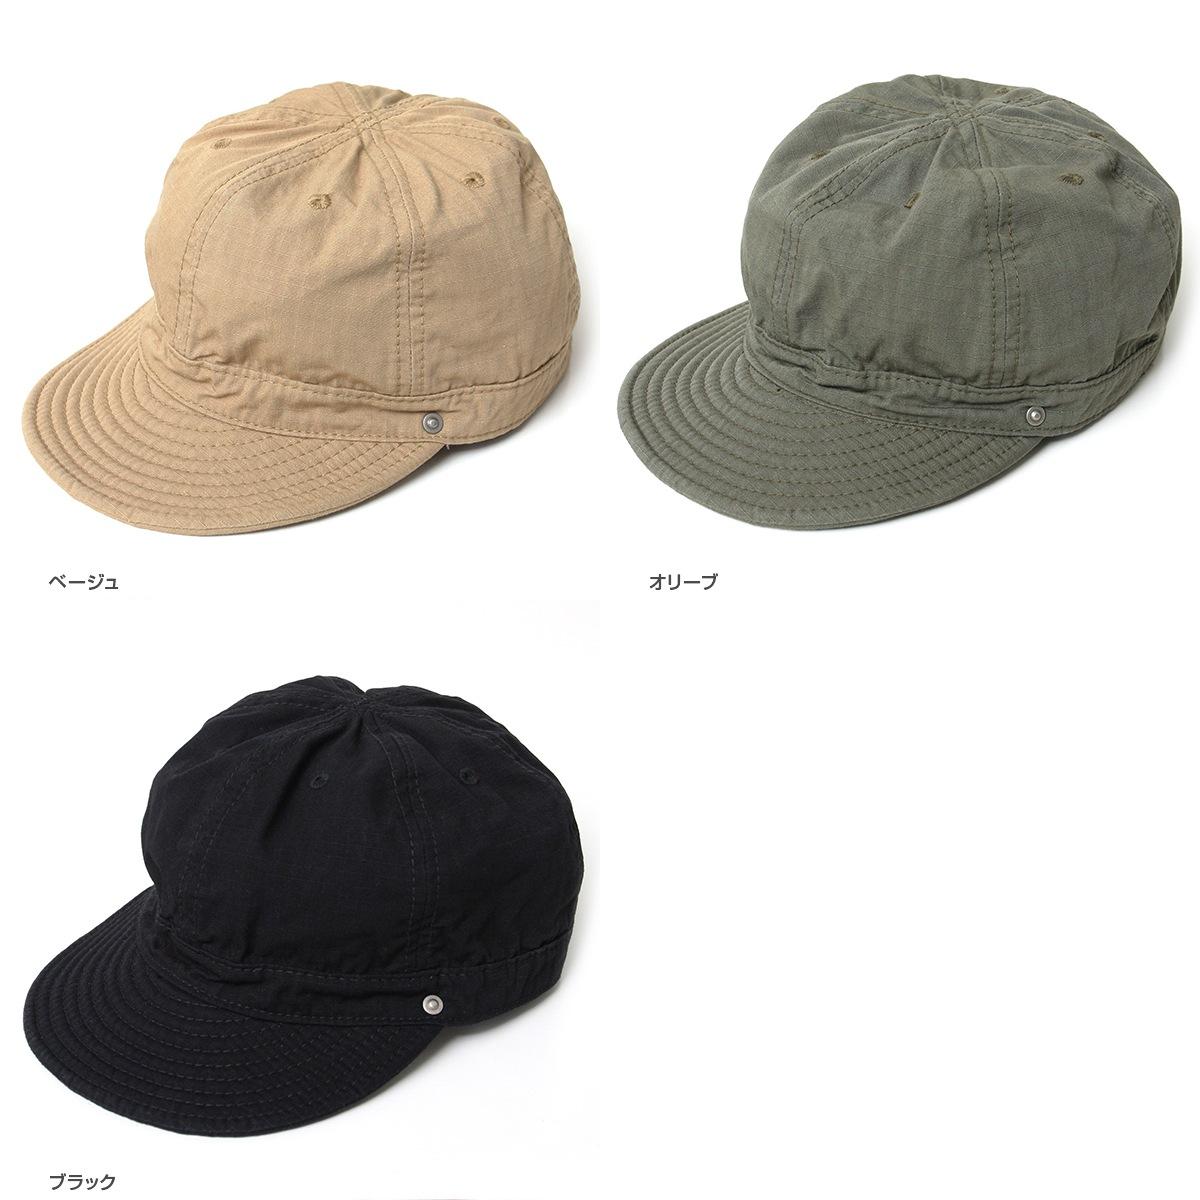 DECHO デコー コメキャップ コーデュラリップ KOME CAP CORDURA RIP 帽子 ベースボールキャップ 7TEX-CR03